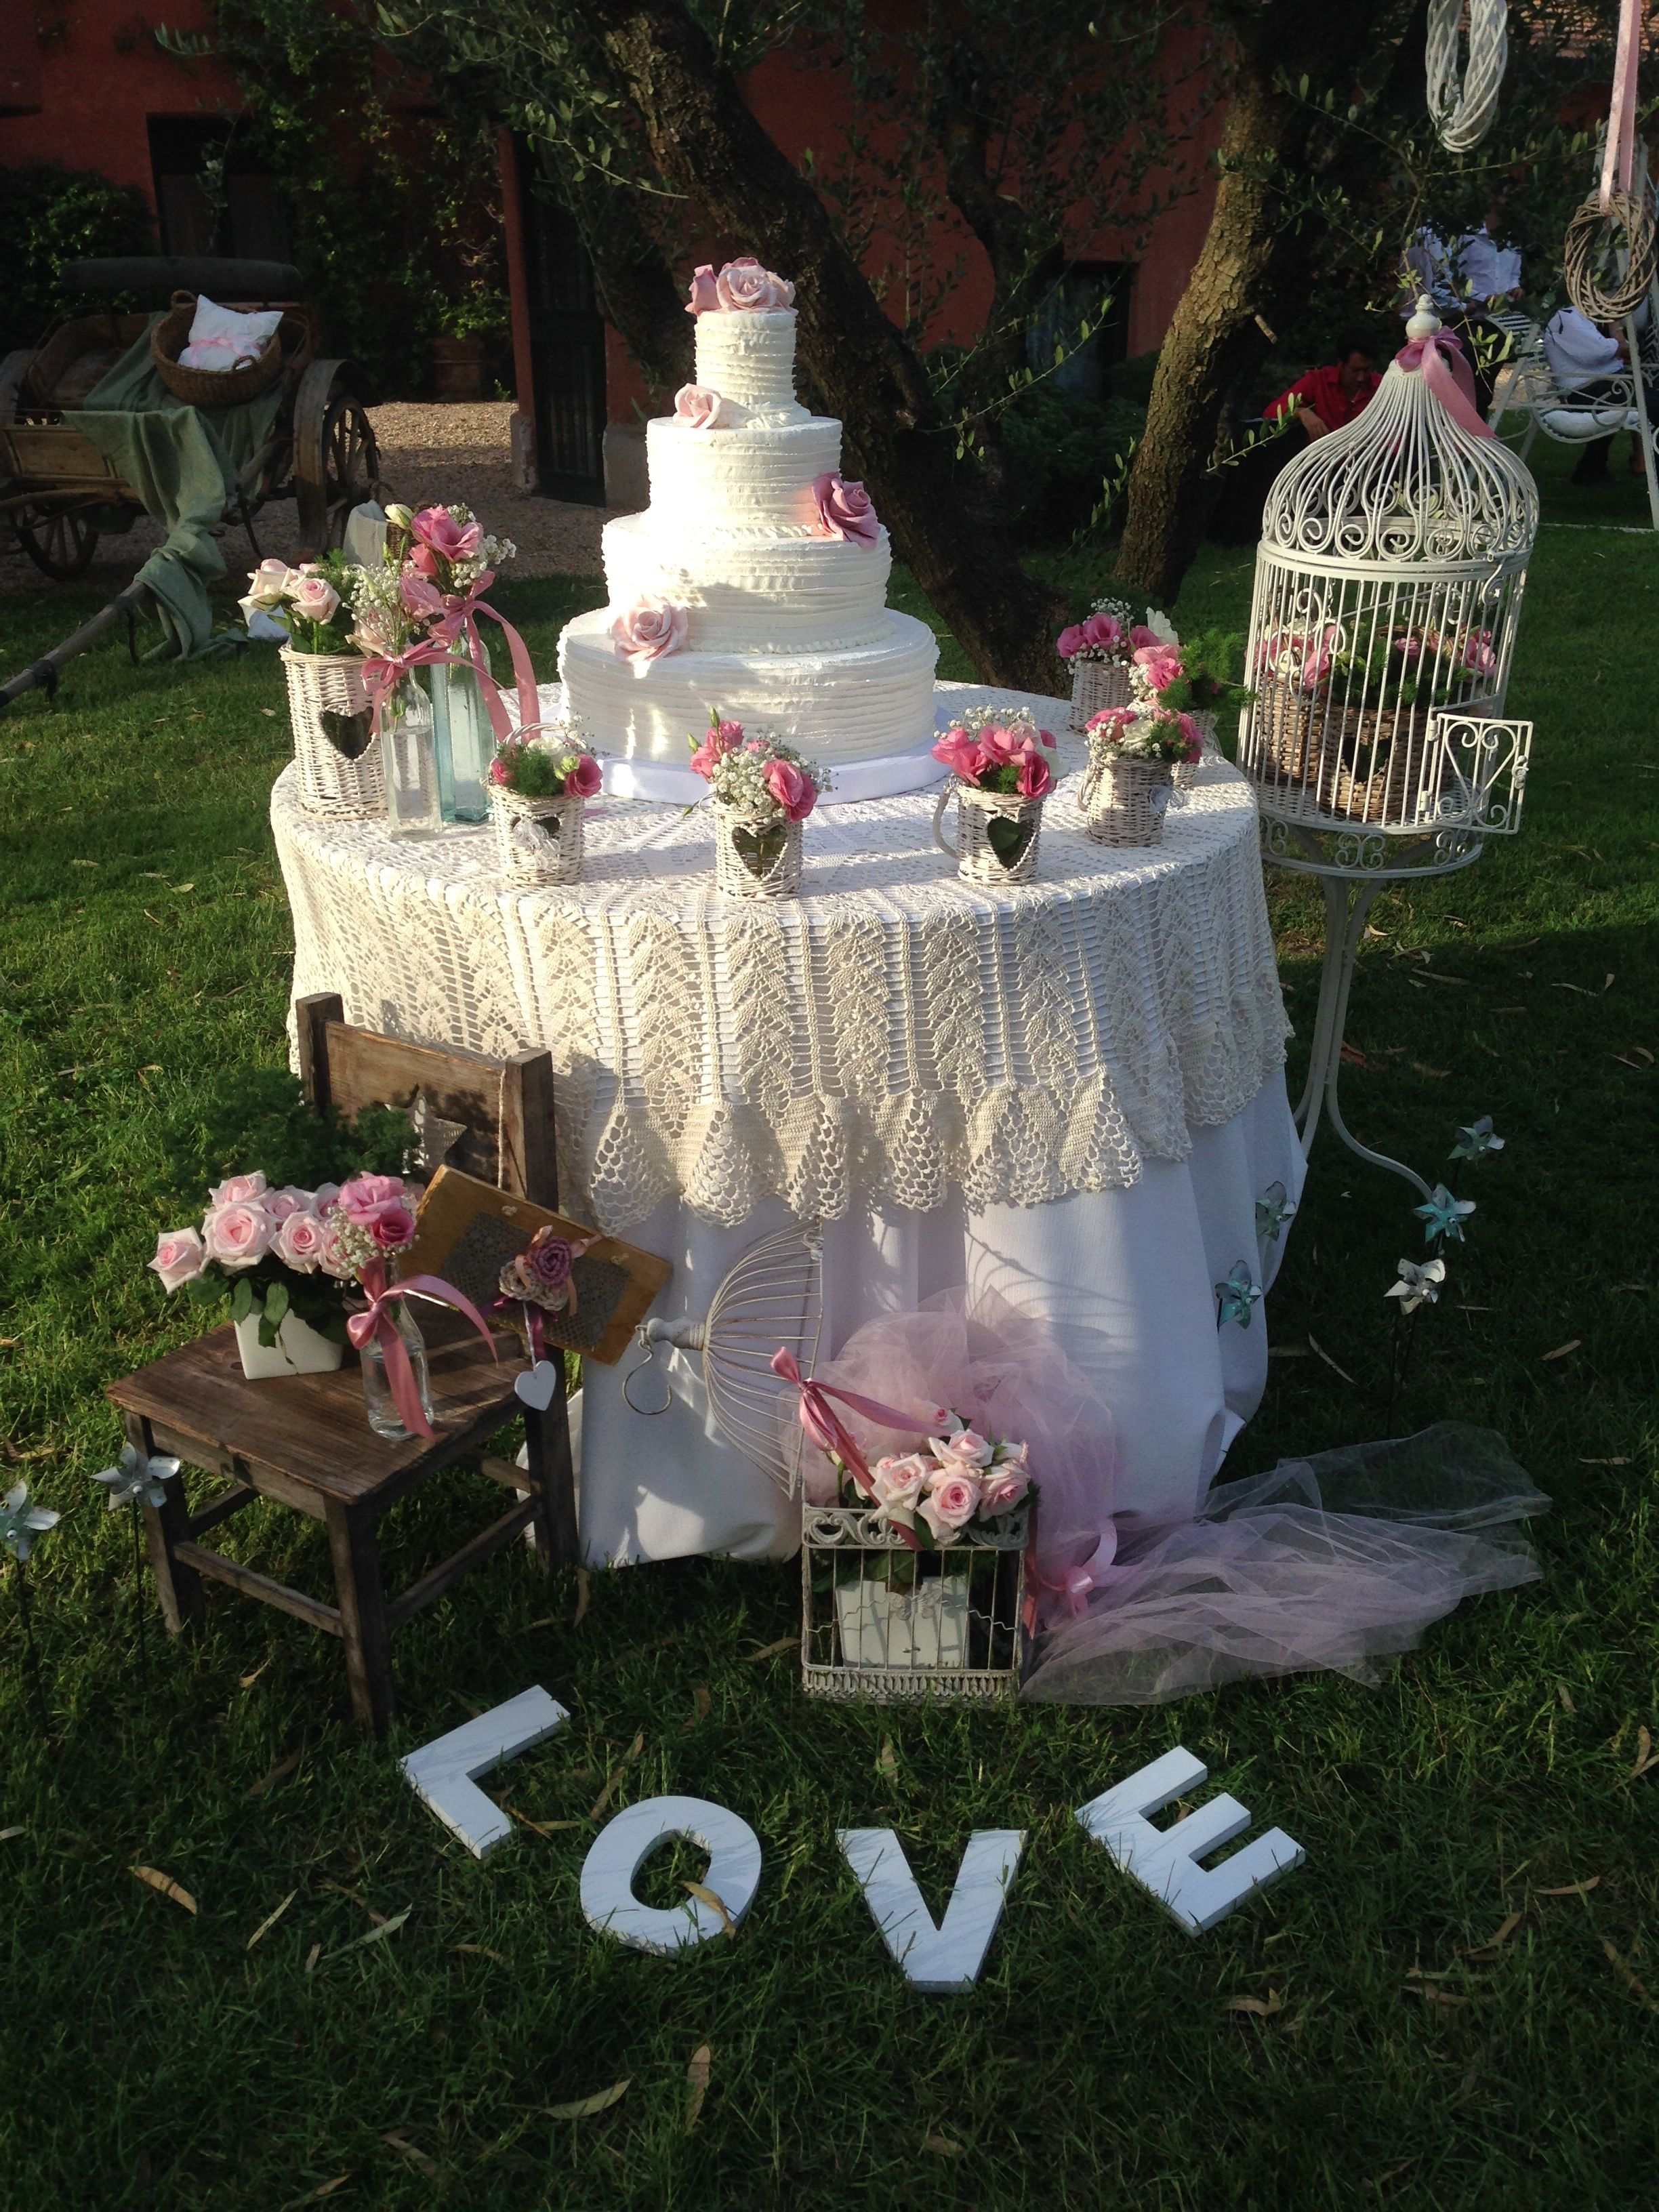 Matrimonio In Stile Country : Torta matrimonio stile country allestimenti floreali per